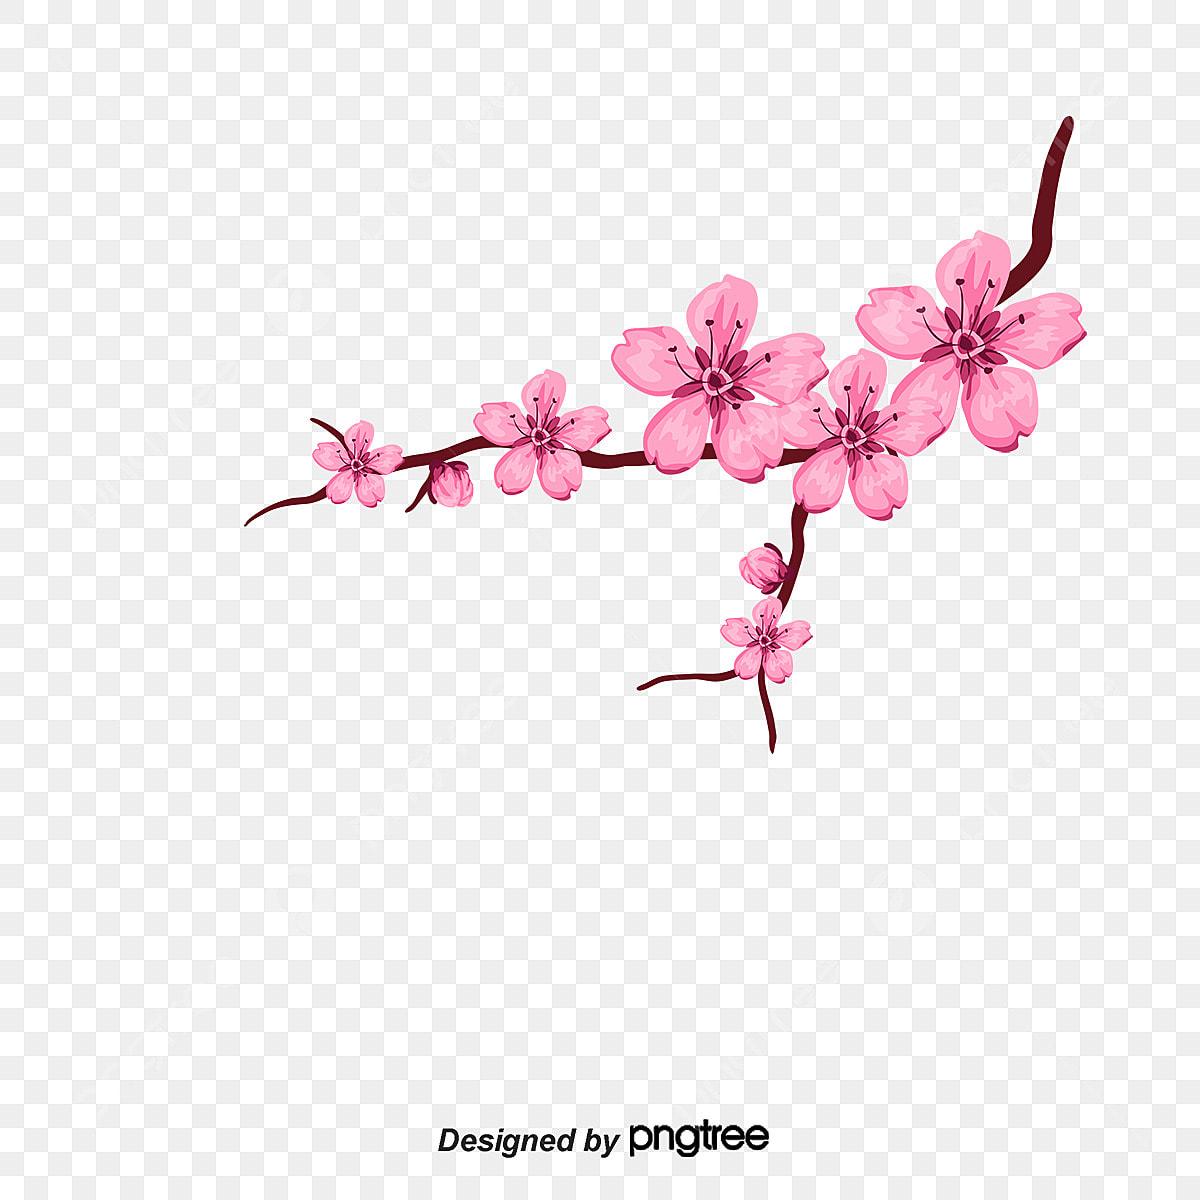 Petalas De Flor De Cerejeira Vector De Petalas Flor De